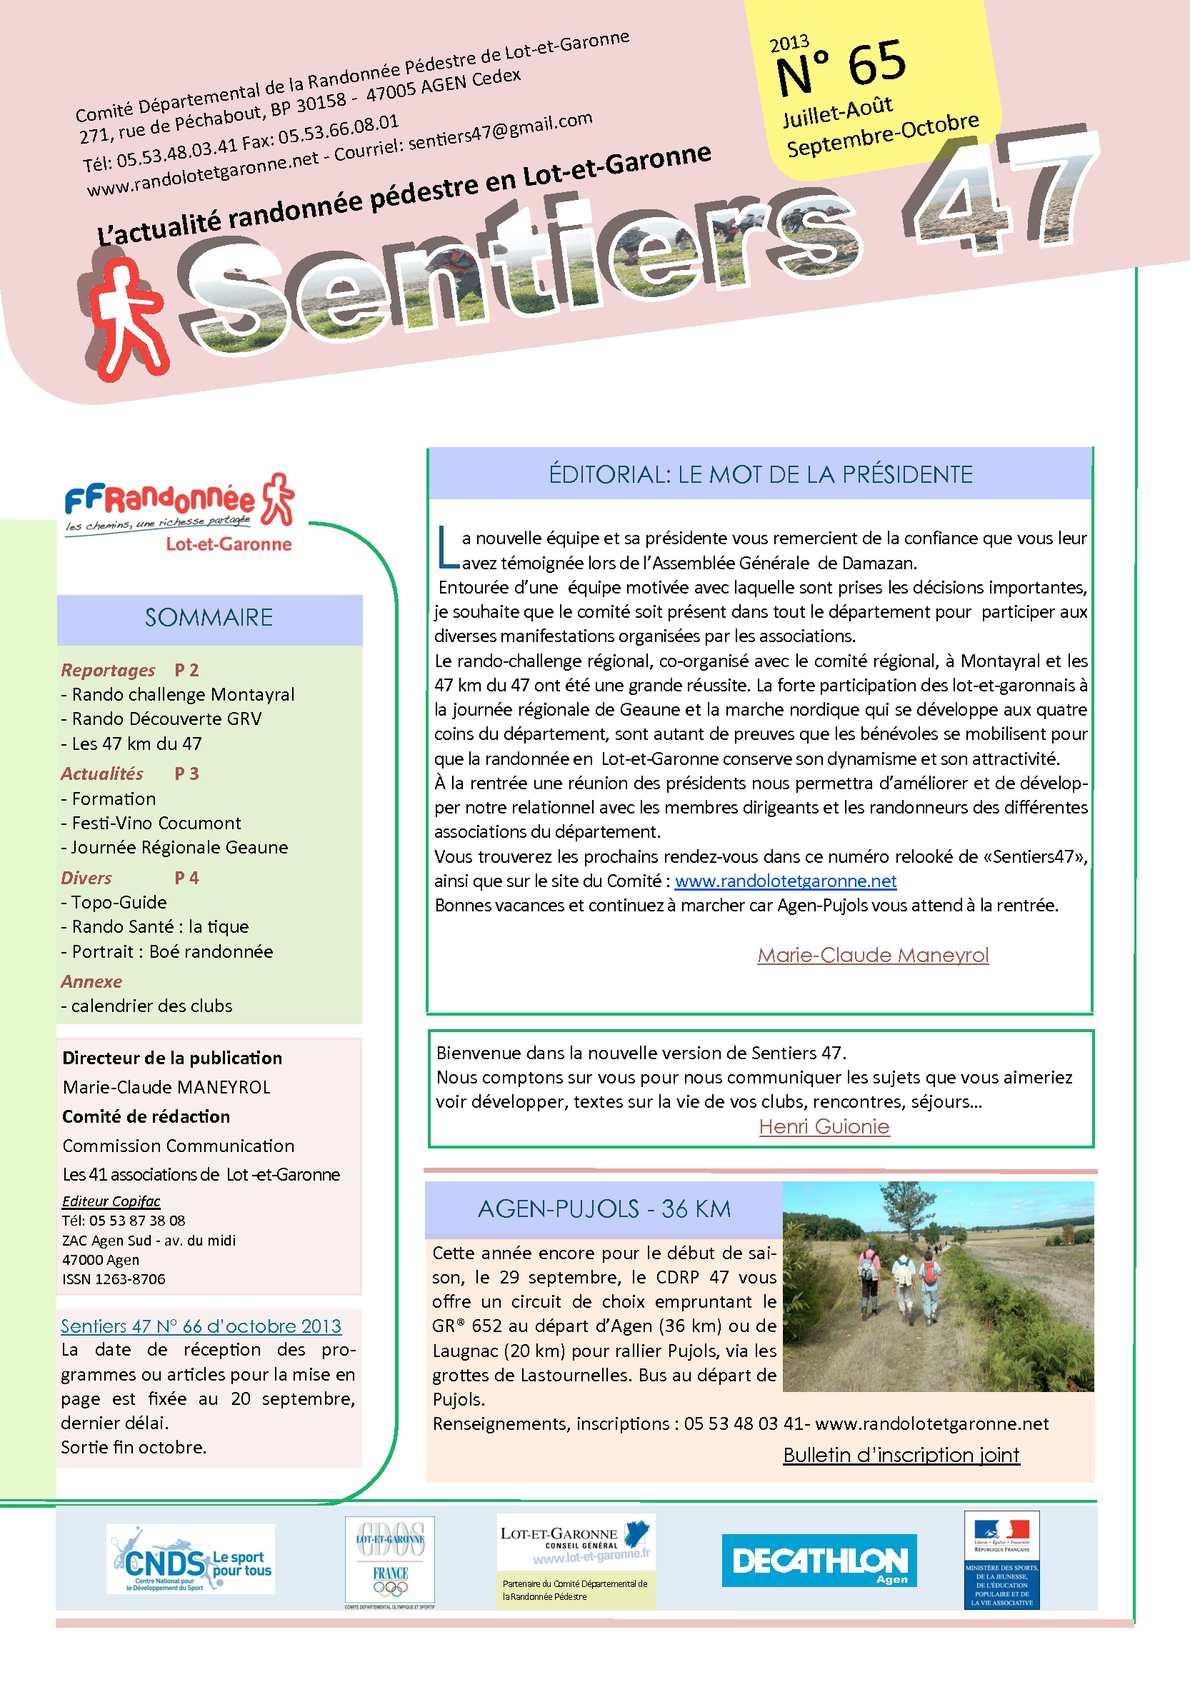 Calendrier Randonnee Pedestre Lot Et Garonne.Calameo Sentiers 47 N 65